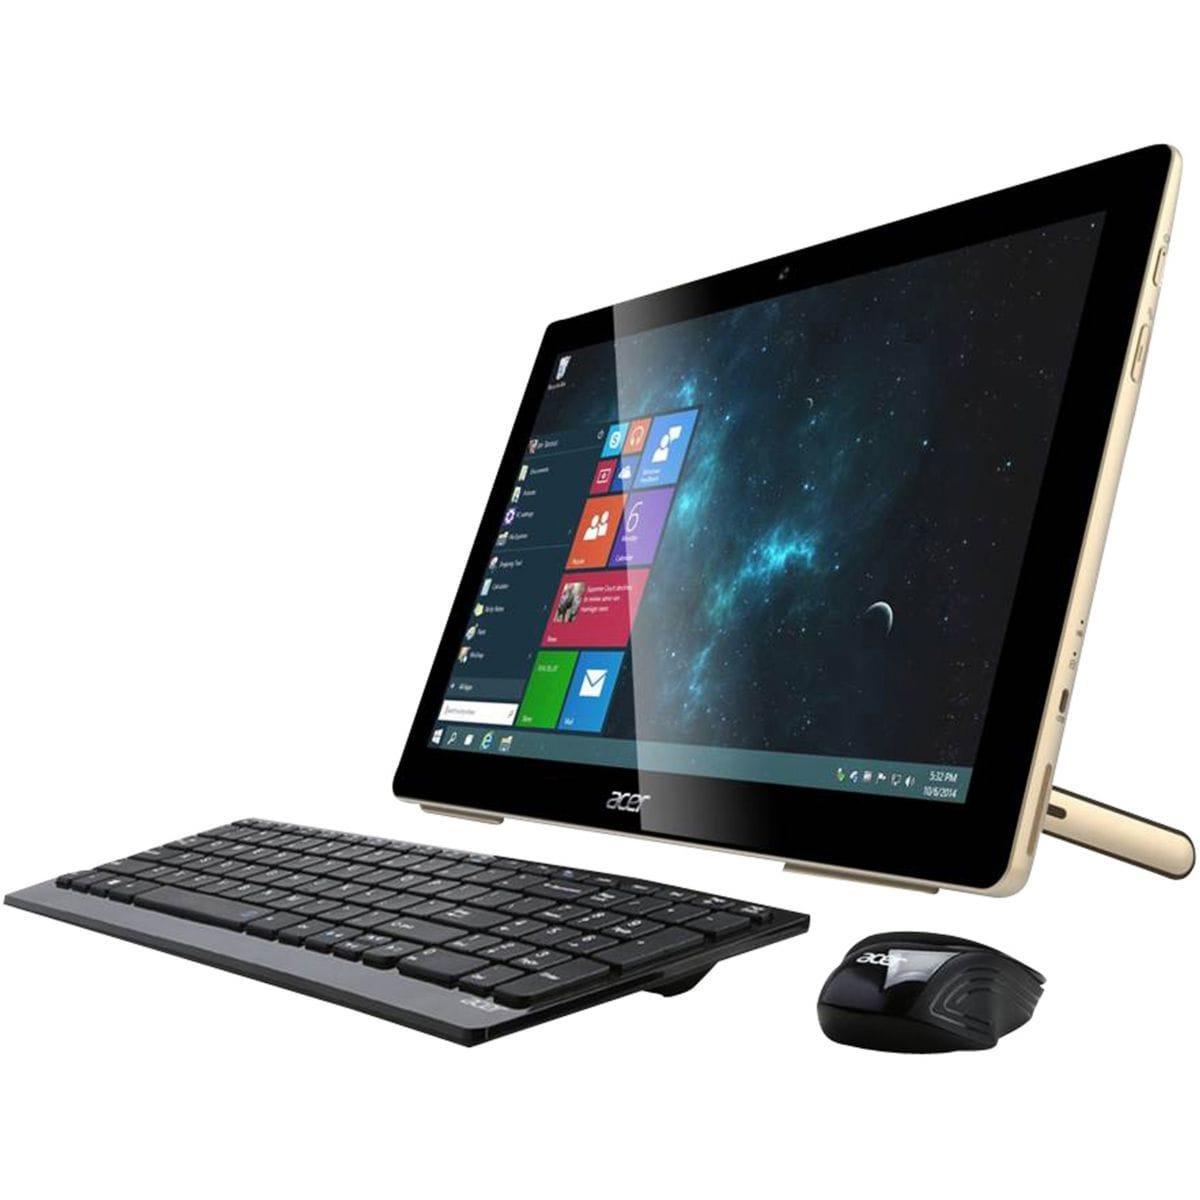 "Acer Aspire Z3 17,3"" Pentium N3700 1,6 GHz  - SSD 32 Go + HDD 1.024 To - RAM 4 Go"